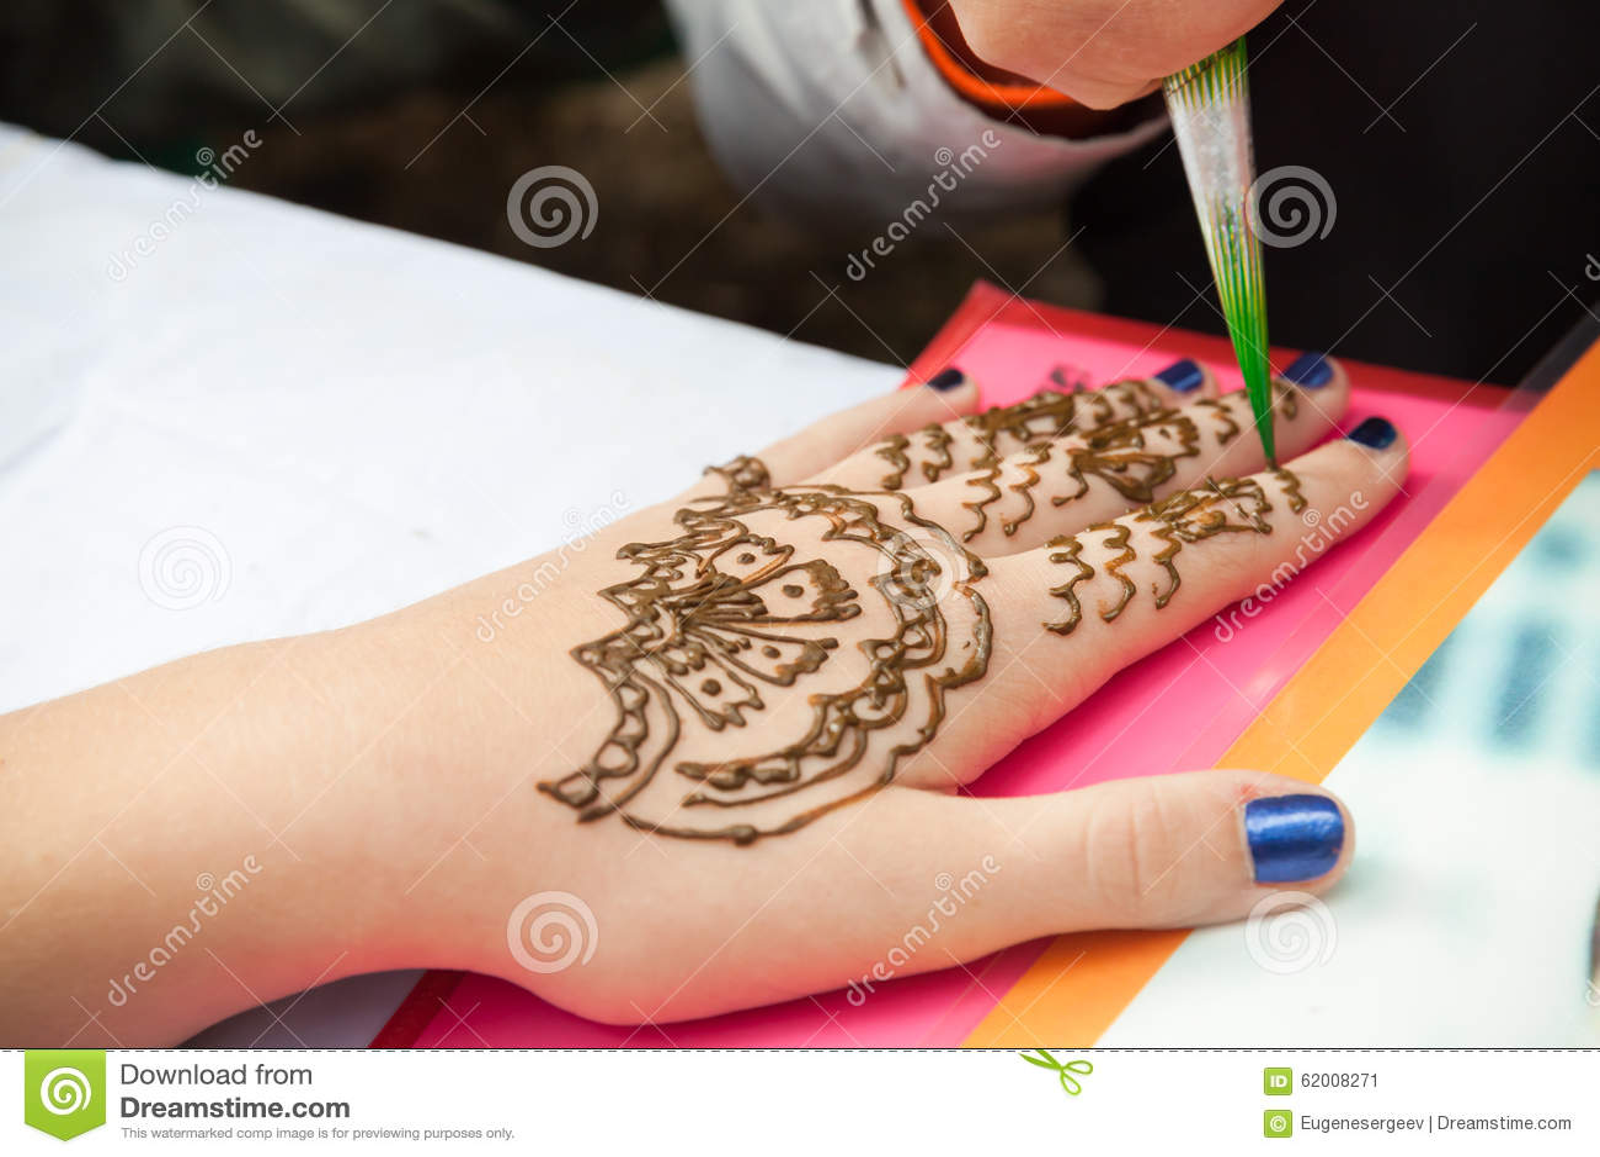 Mehndi application on woman hand skin decoration Application decoration